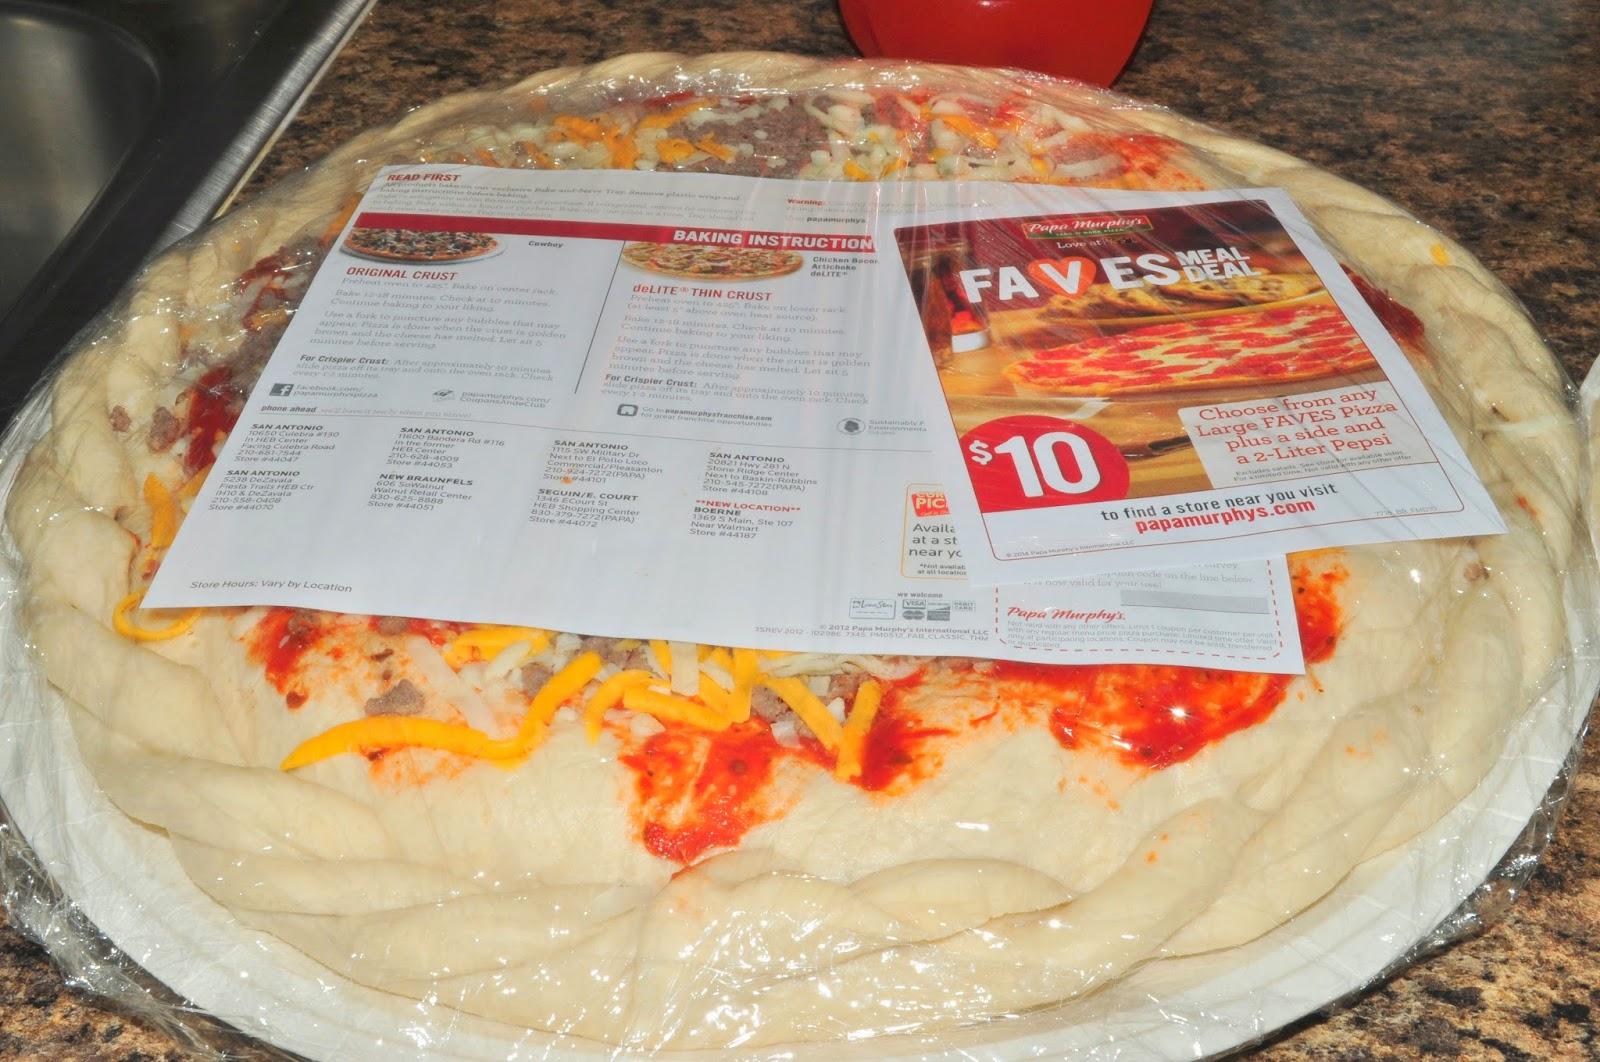 costco pizza baking instructions